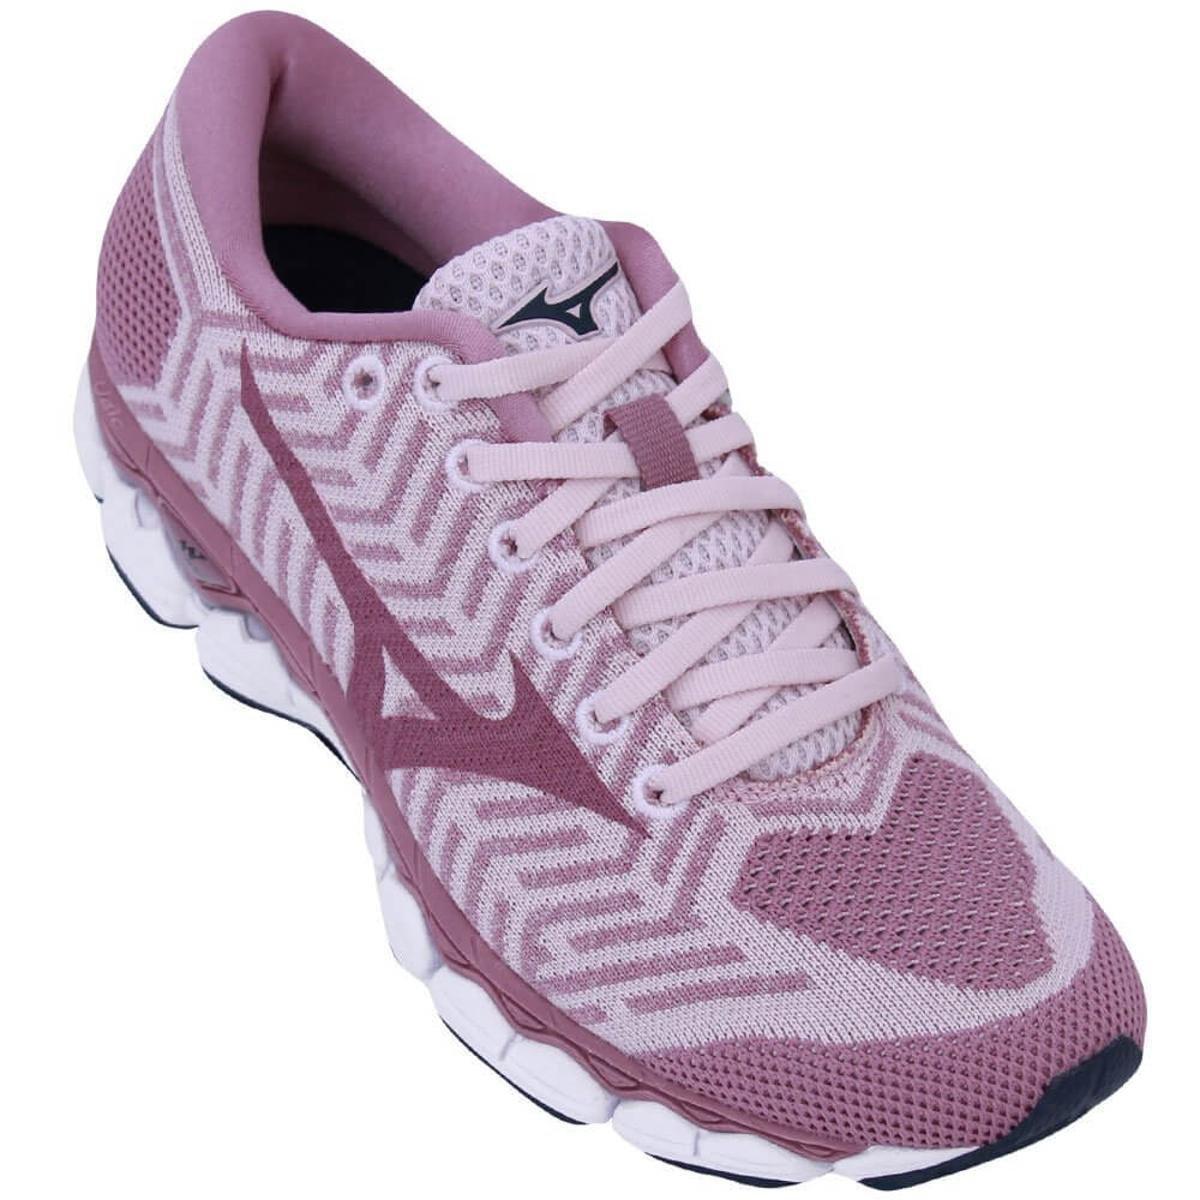 Menor preço em Tênis Mizuno Wave Knit S1 Feminino - Rosa